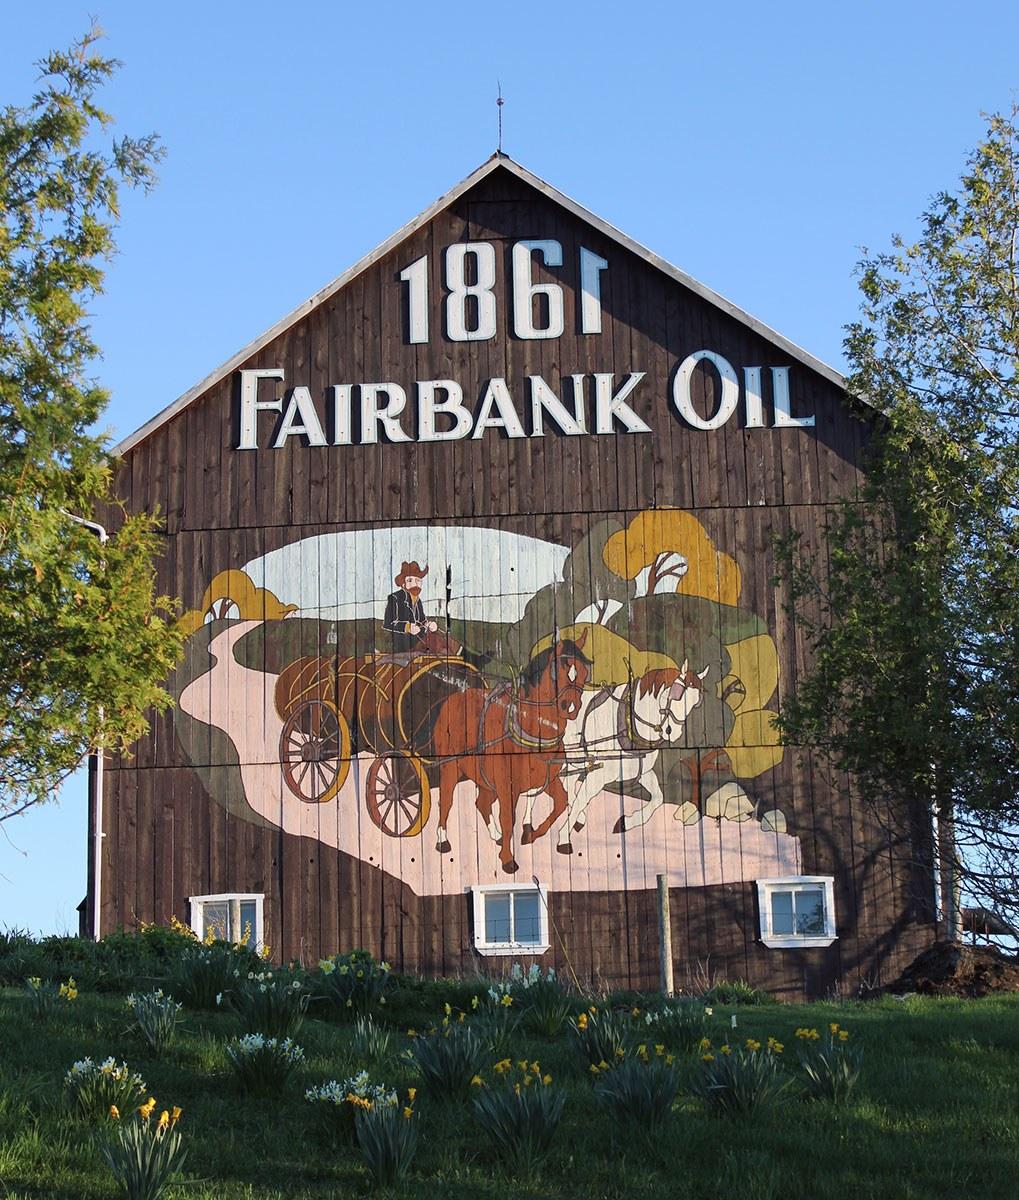 Fairbank Oil barn (Photo courtesy of Charles Oliver Fairbank III)